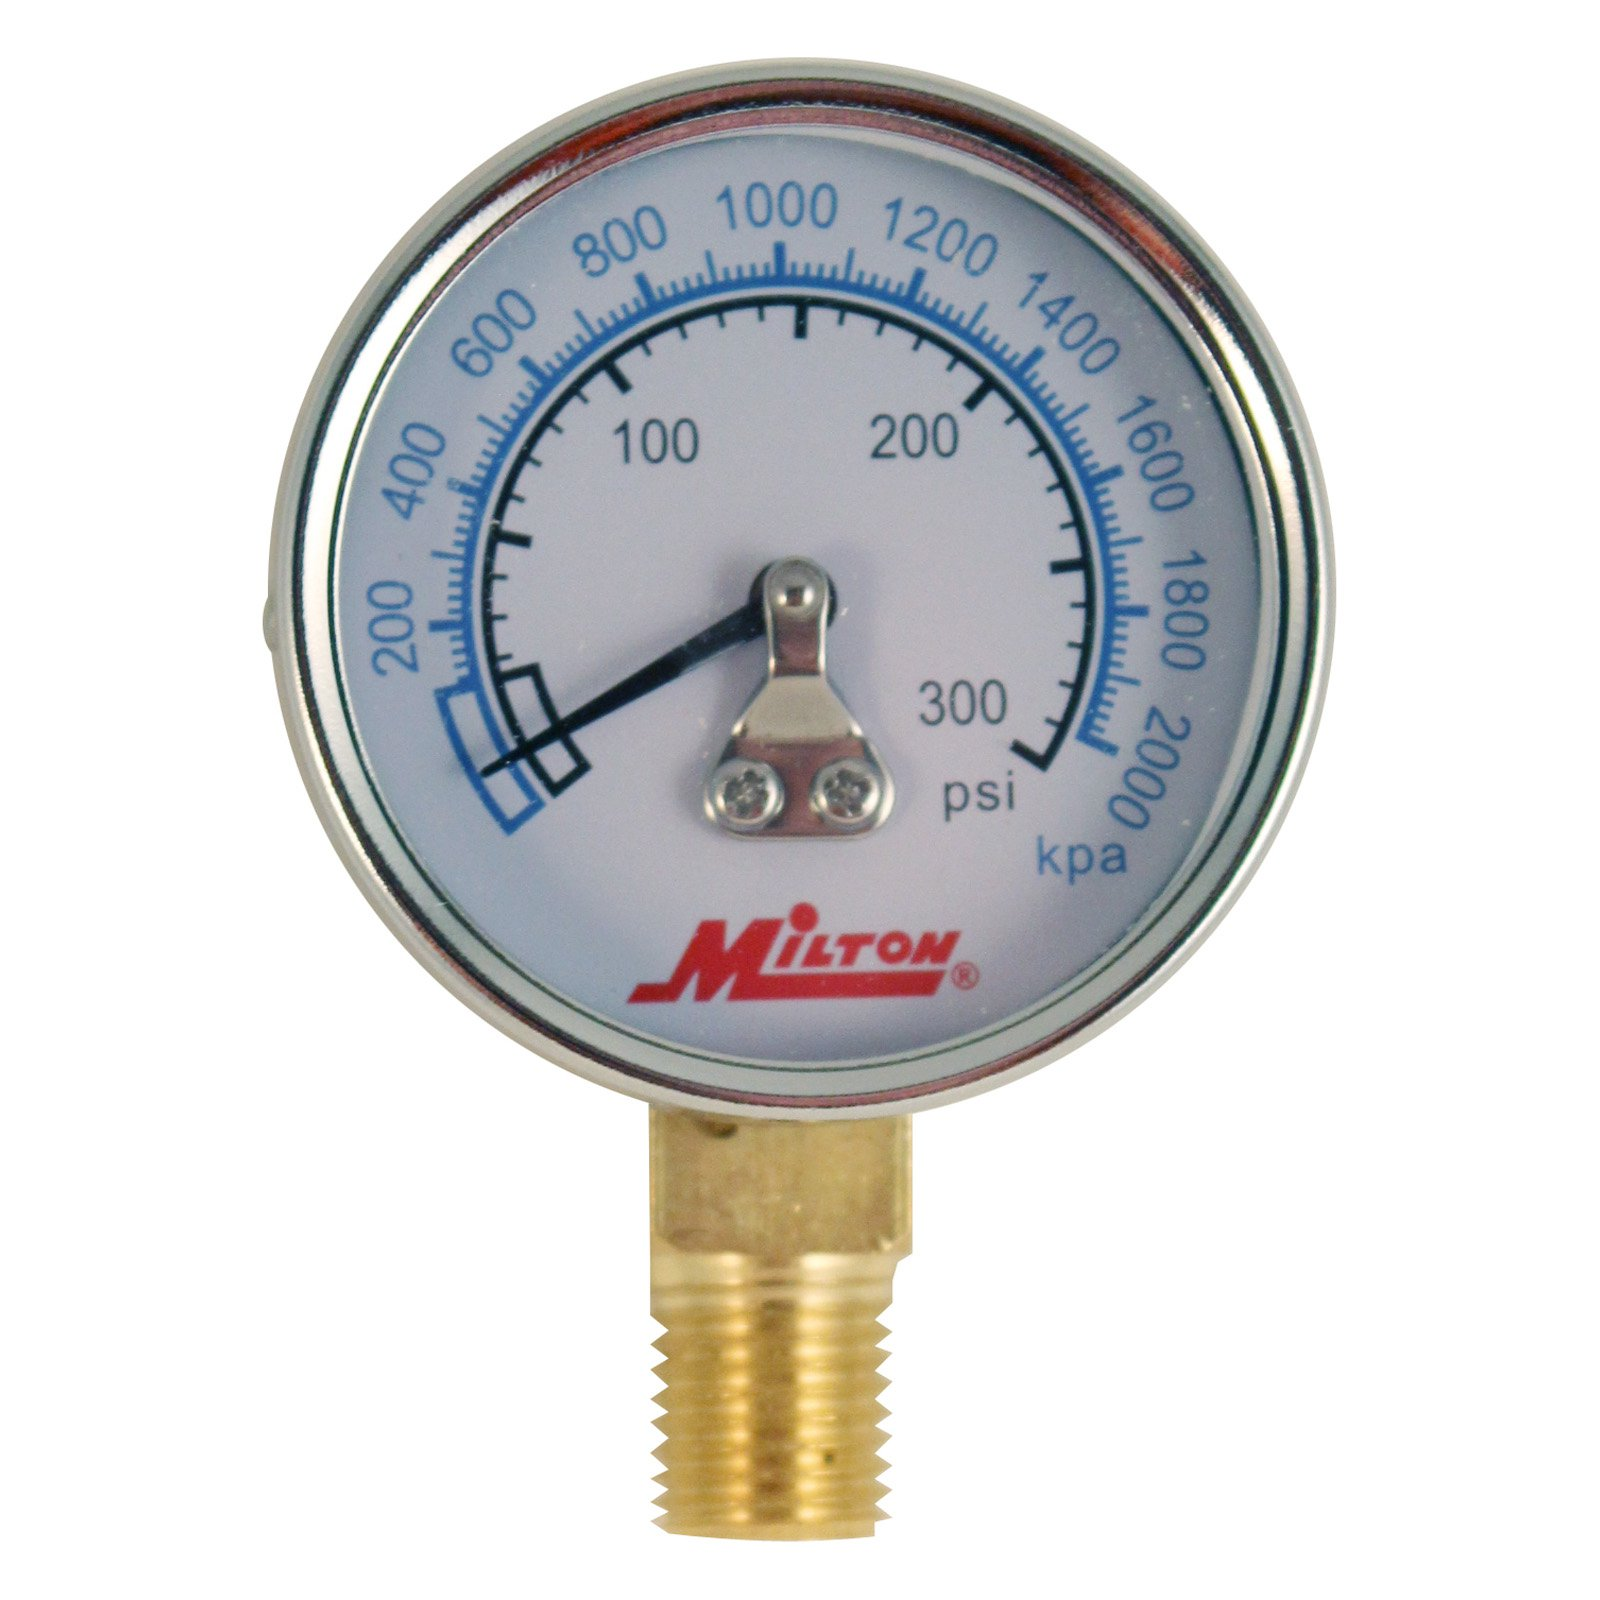 "Milton 1195 1/4"" NPT High Pressure Gage"